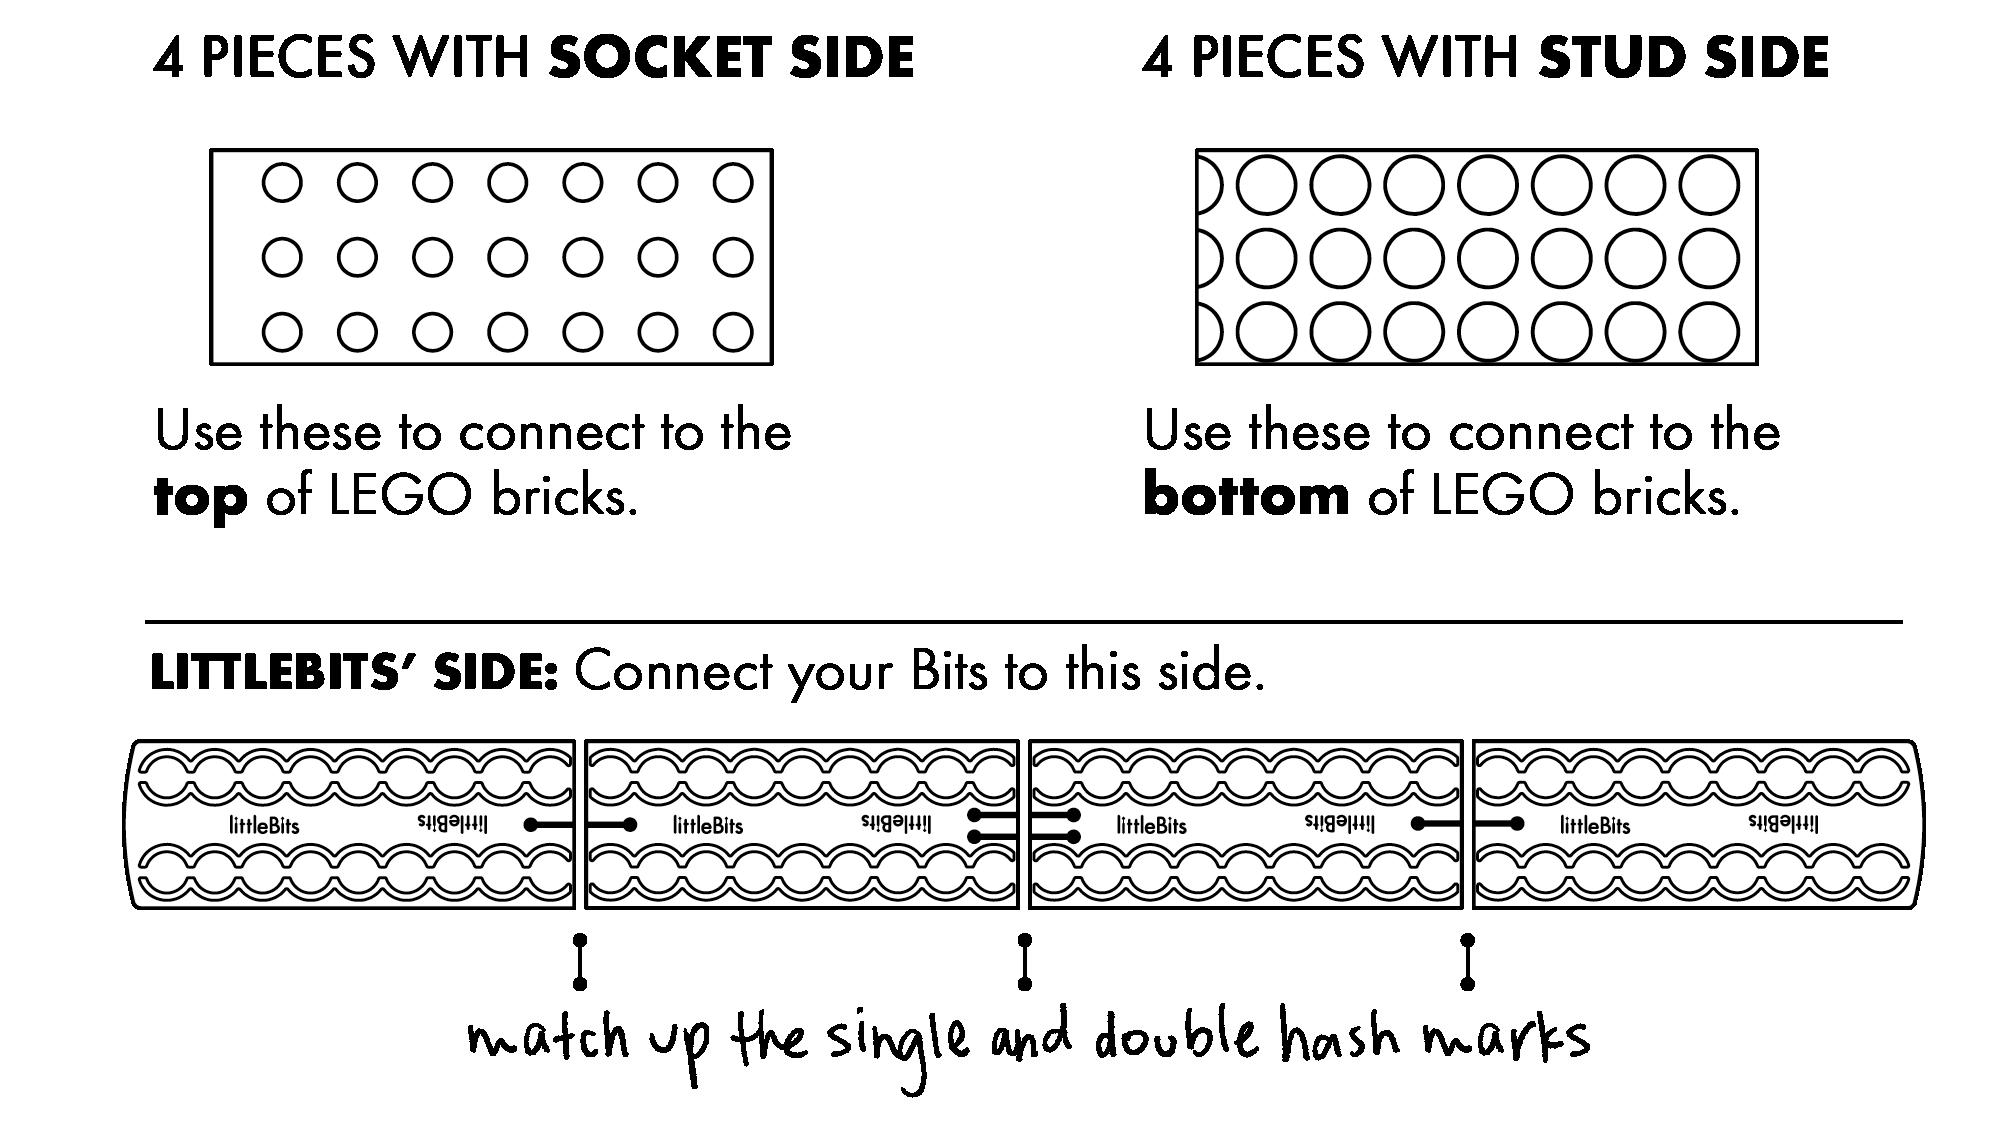 width=500 height=281 /></p> Product Code & UPC<br />LB-660-0015-0000A : 810876020558</div>   </div>   </div>   <div role=